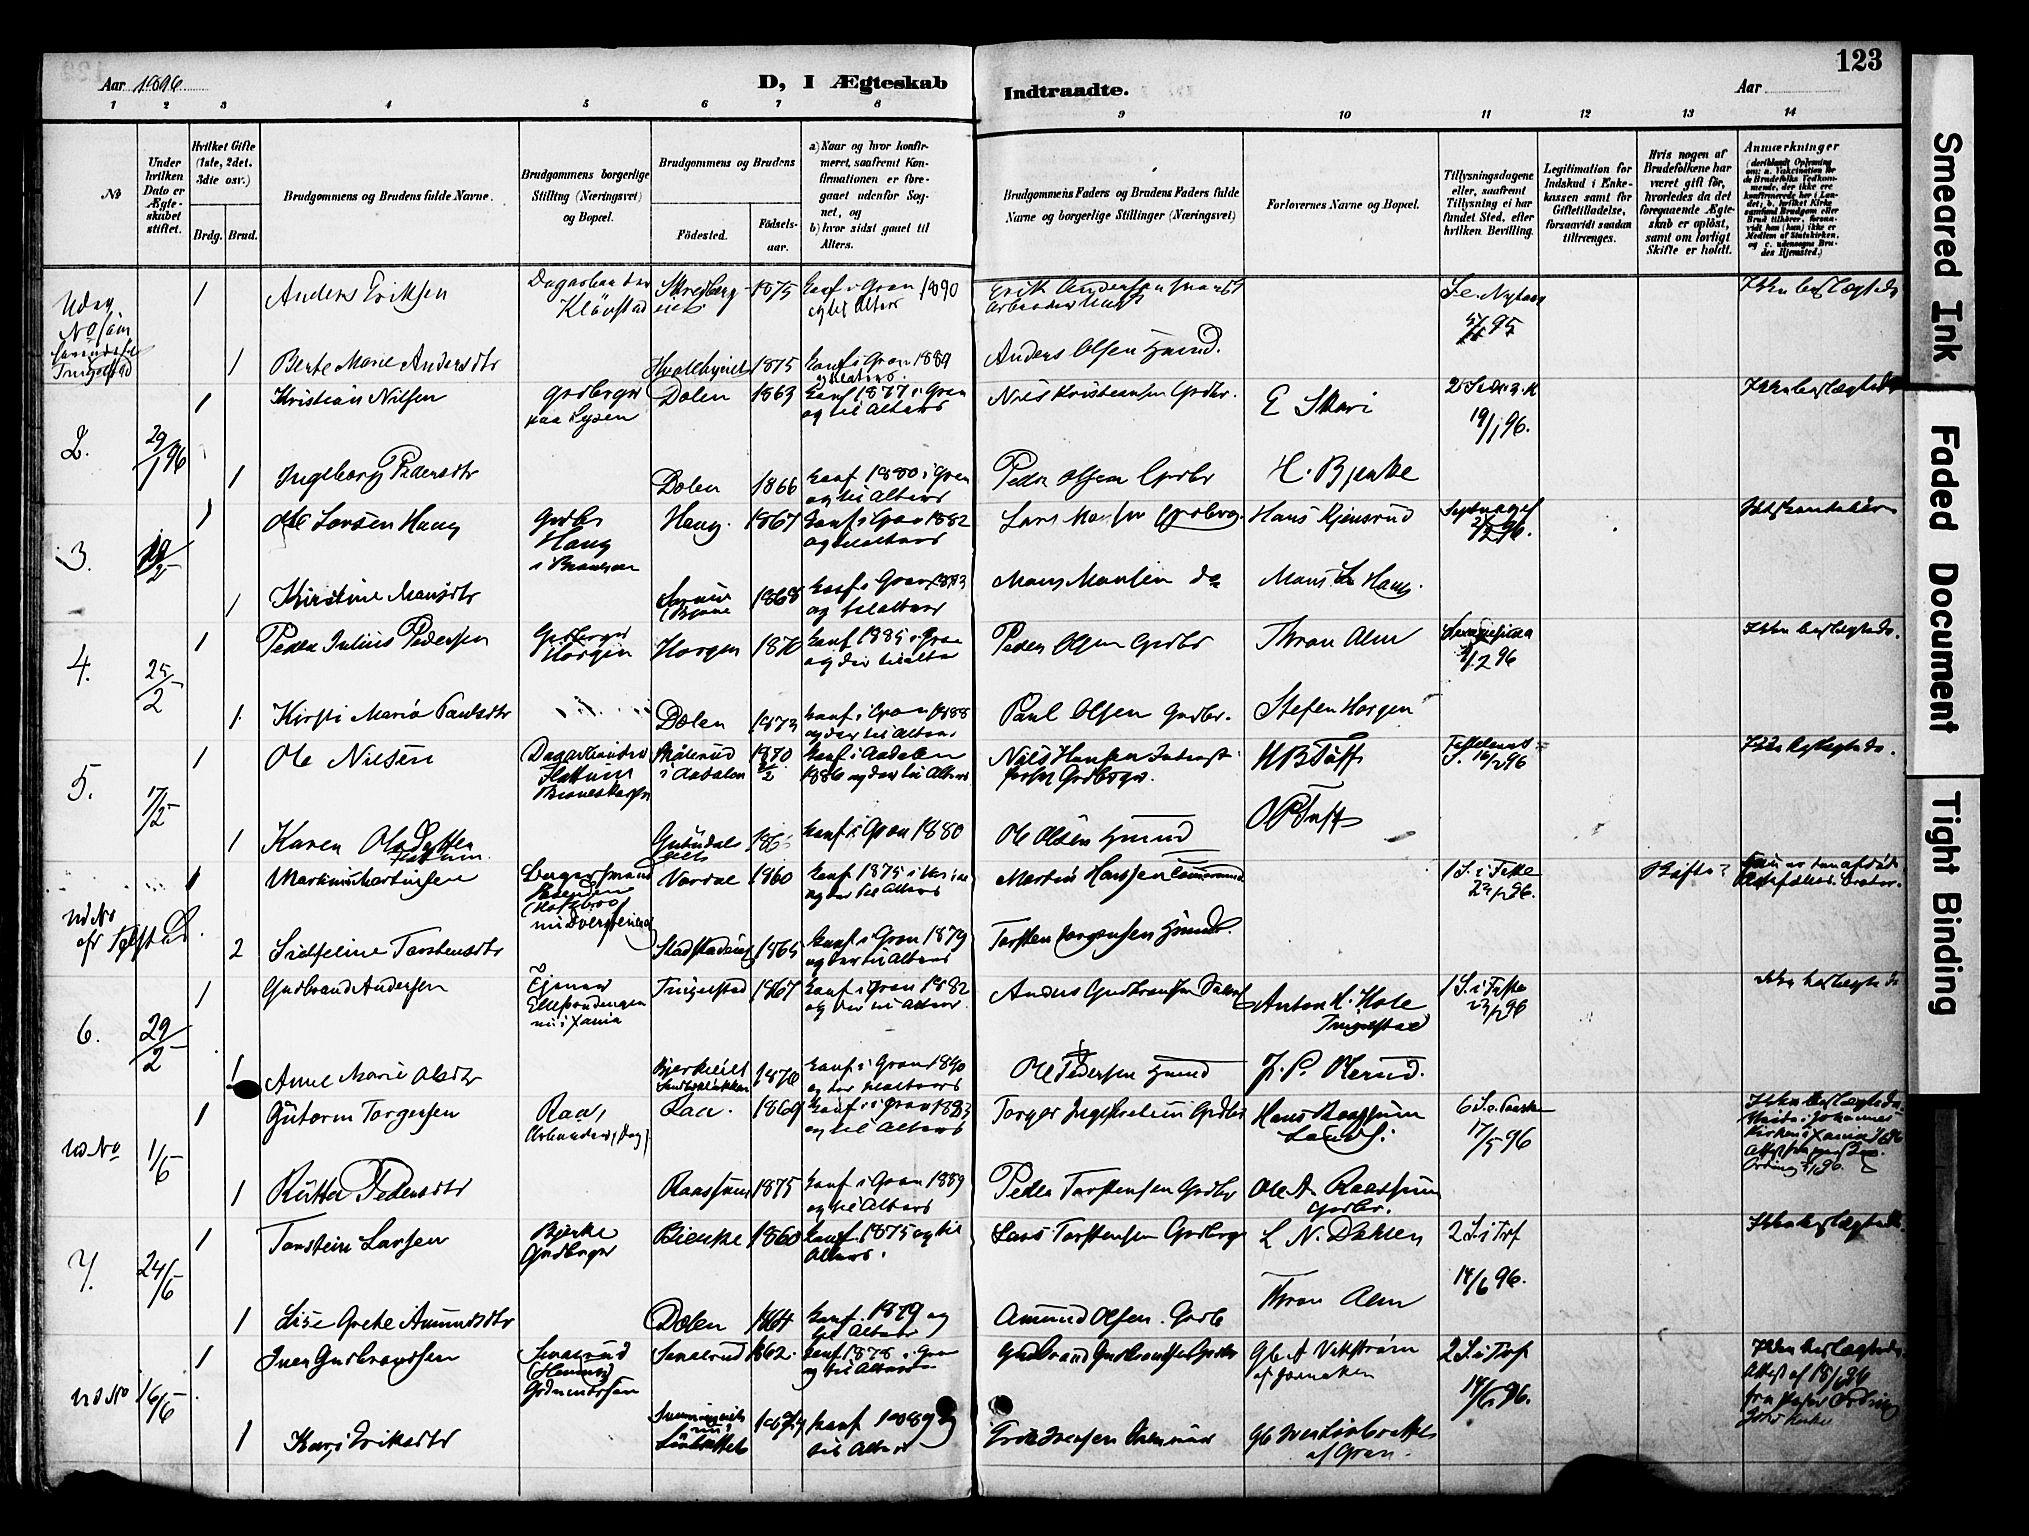 SAH, Gran prestekontor, Ministerialbok nr. 20, 1889-1899, s. 123